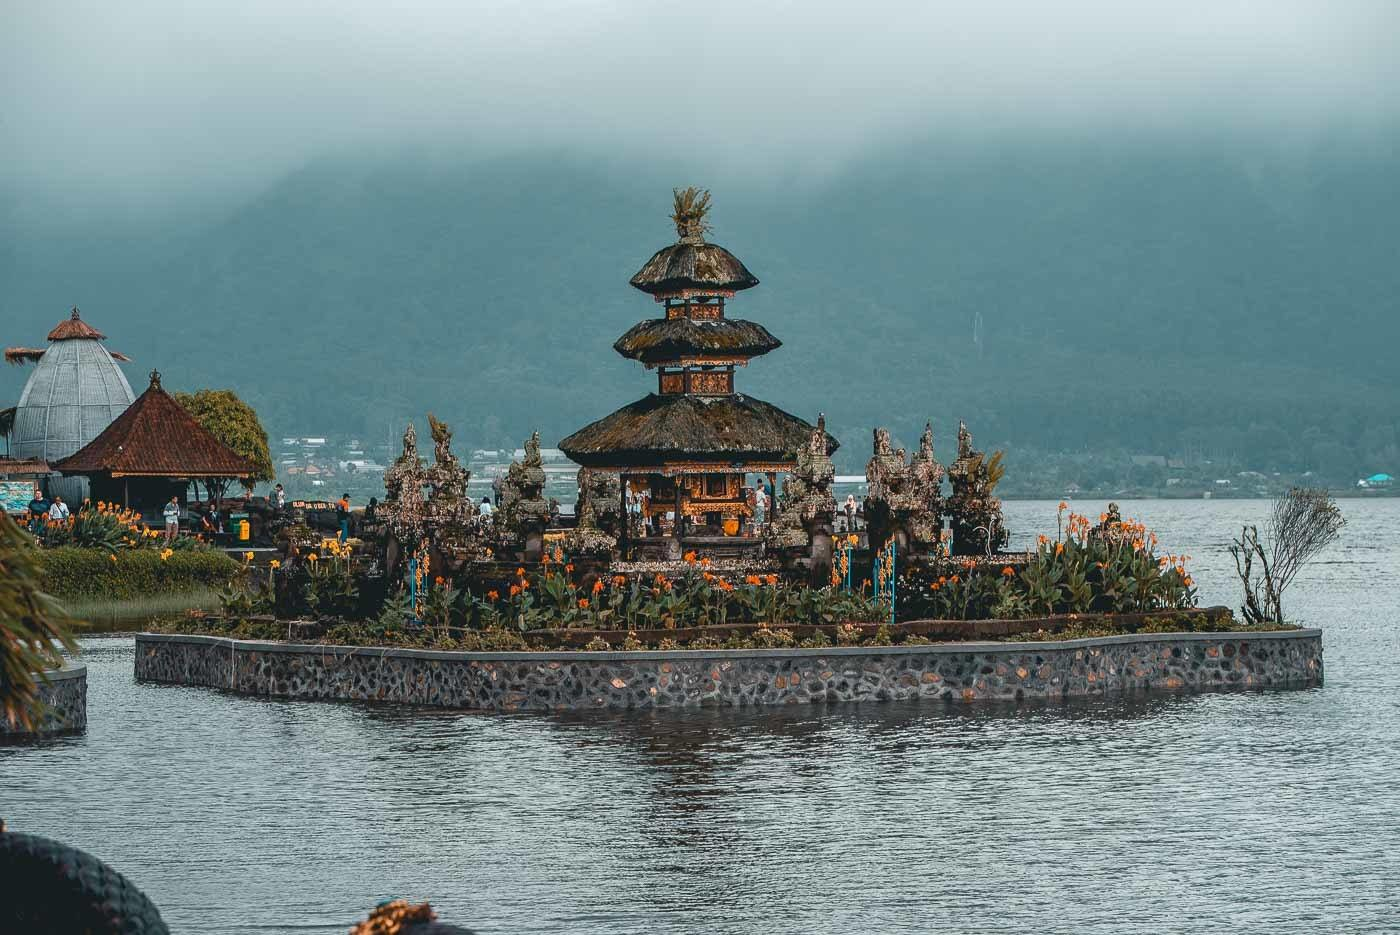 Bali Honeymoon Travel Guide